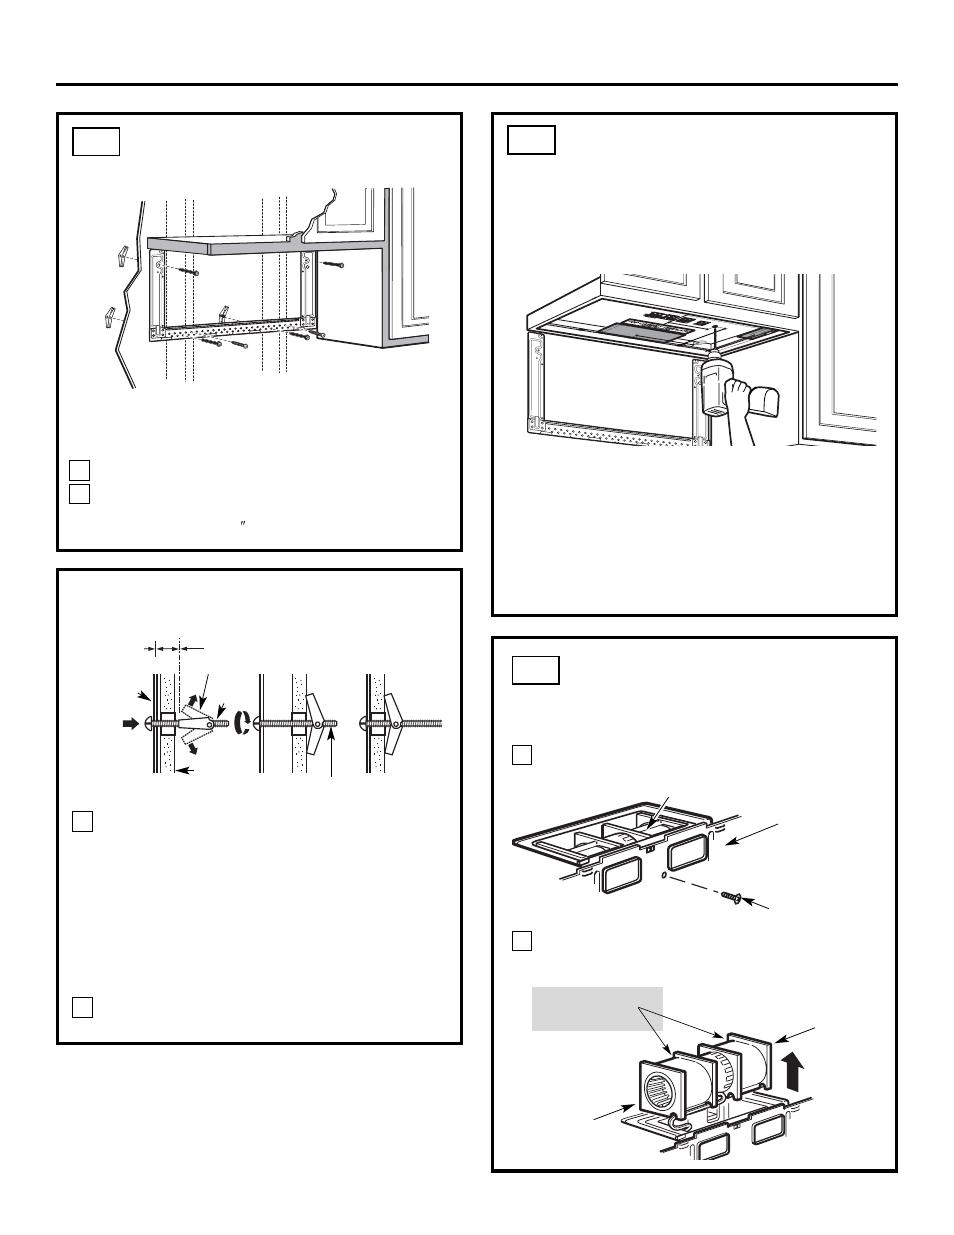 Frigidaire 316495063 User Manual